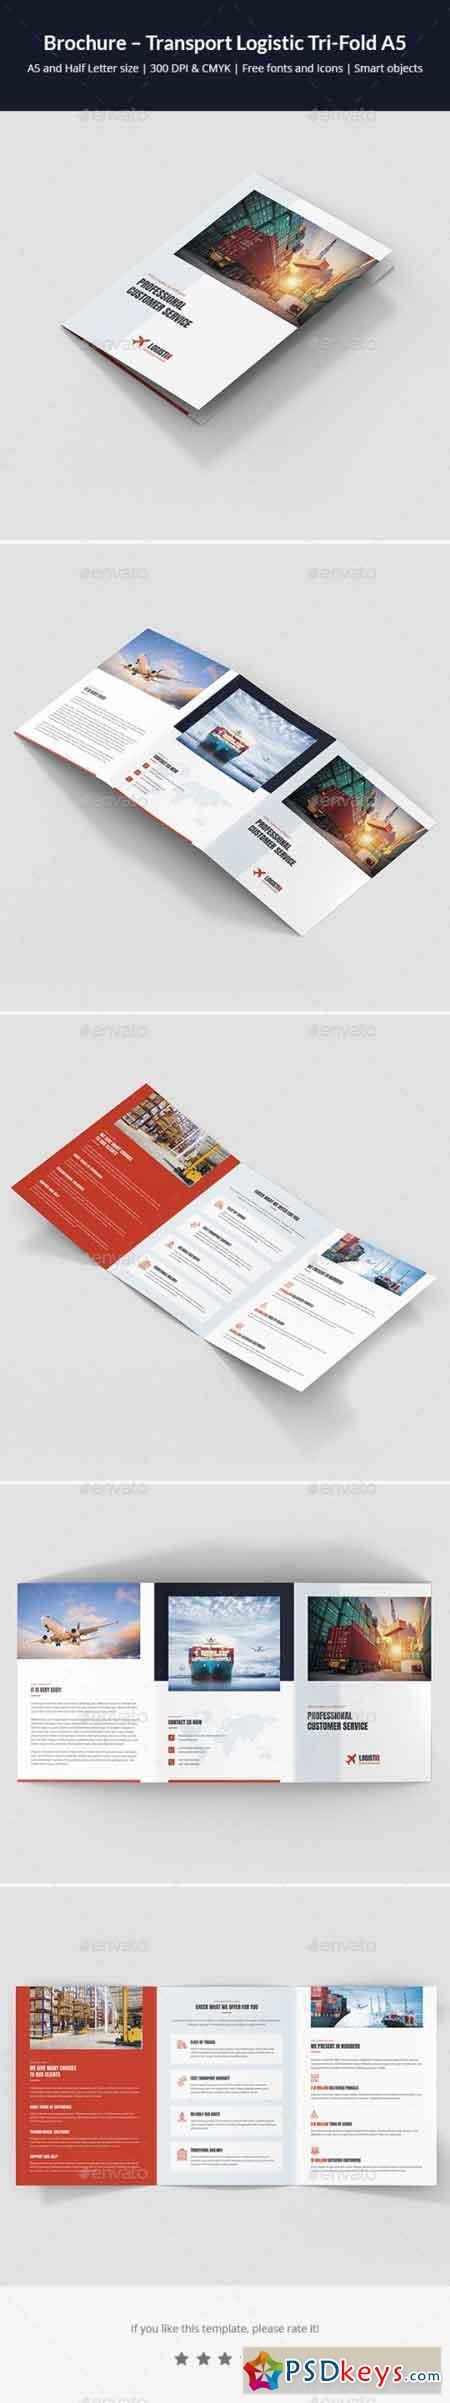 Brochure – Transport Logistic Tri-Fold A5 21805581